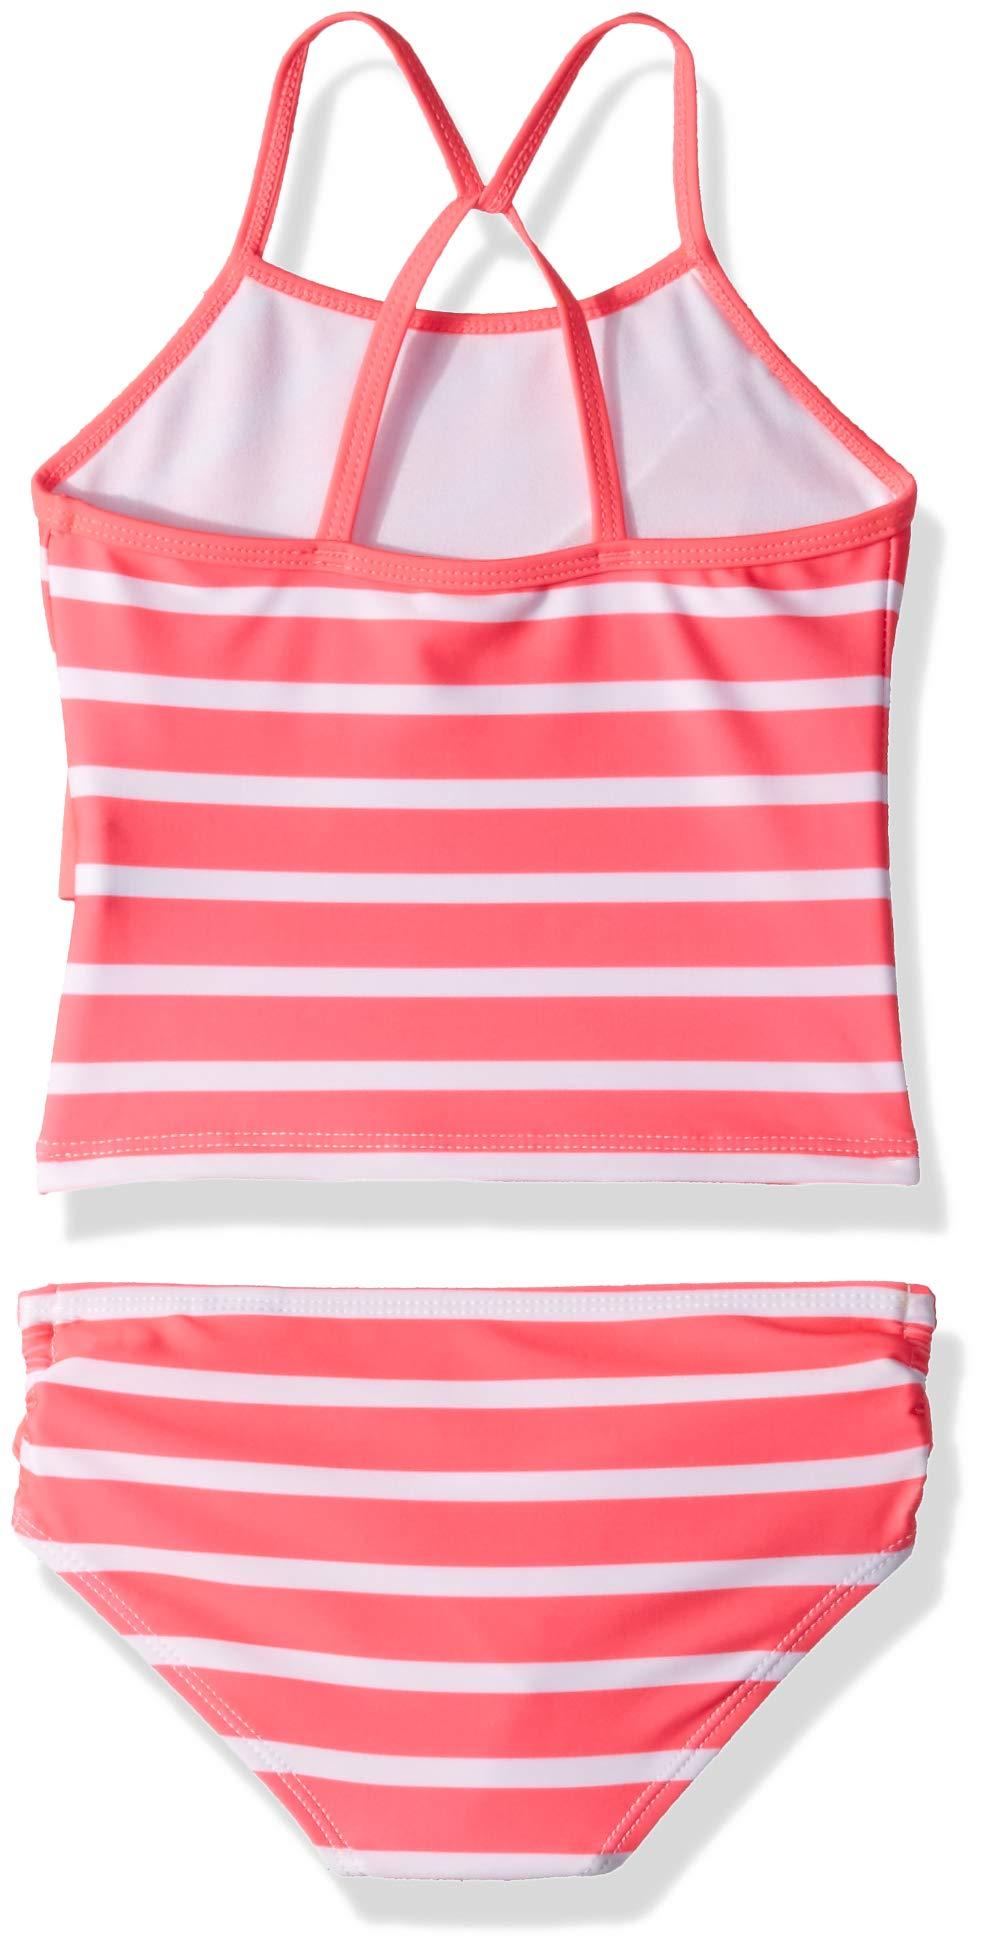 Nautica Little Girls' Tankini Swim Suit, Stripe neon Pink, 6 by Nautica (Image #2)